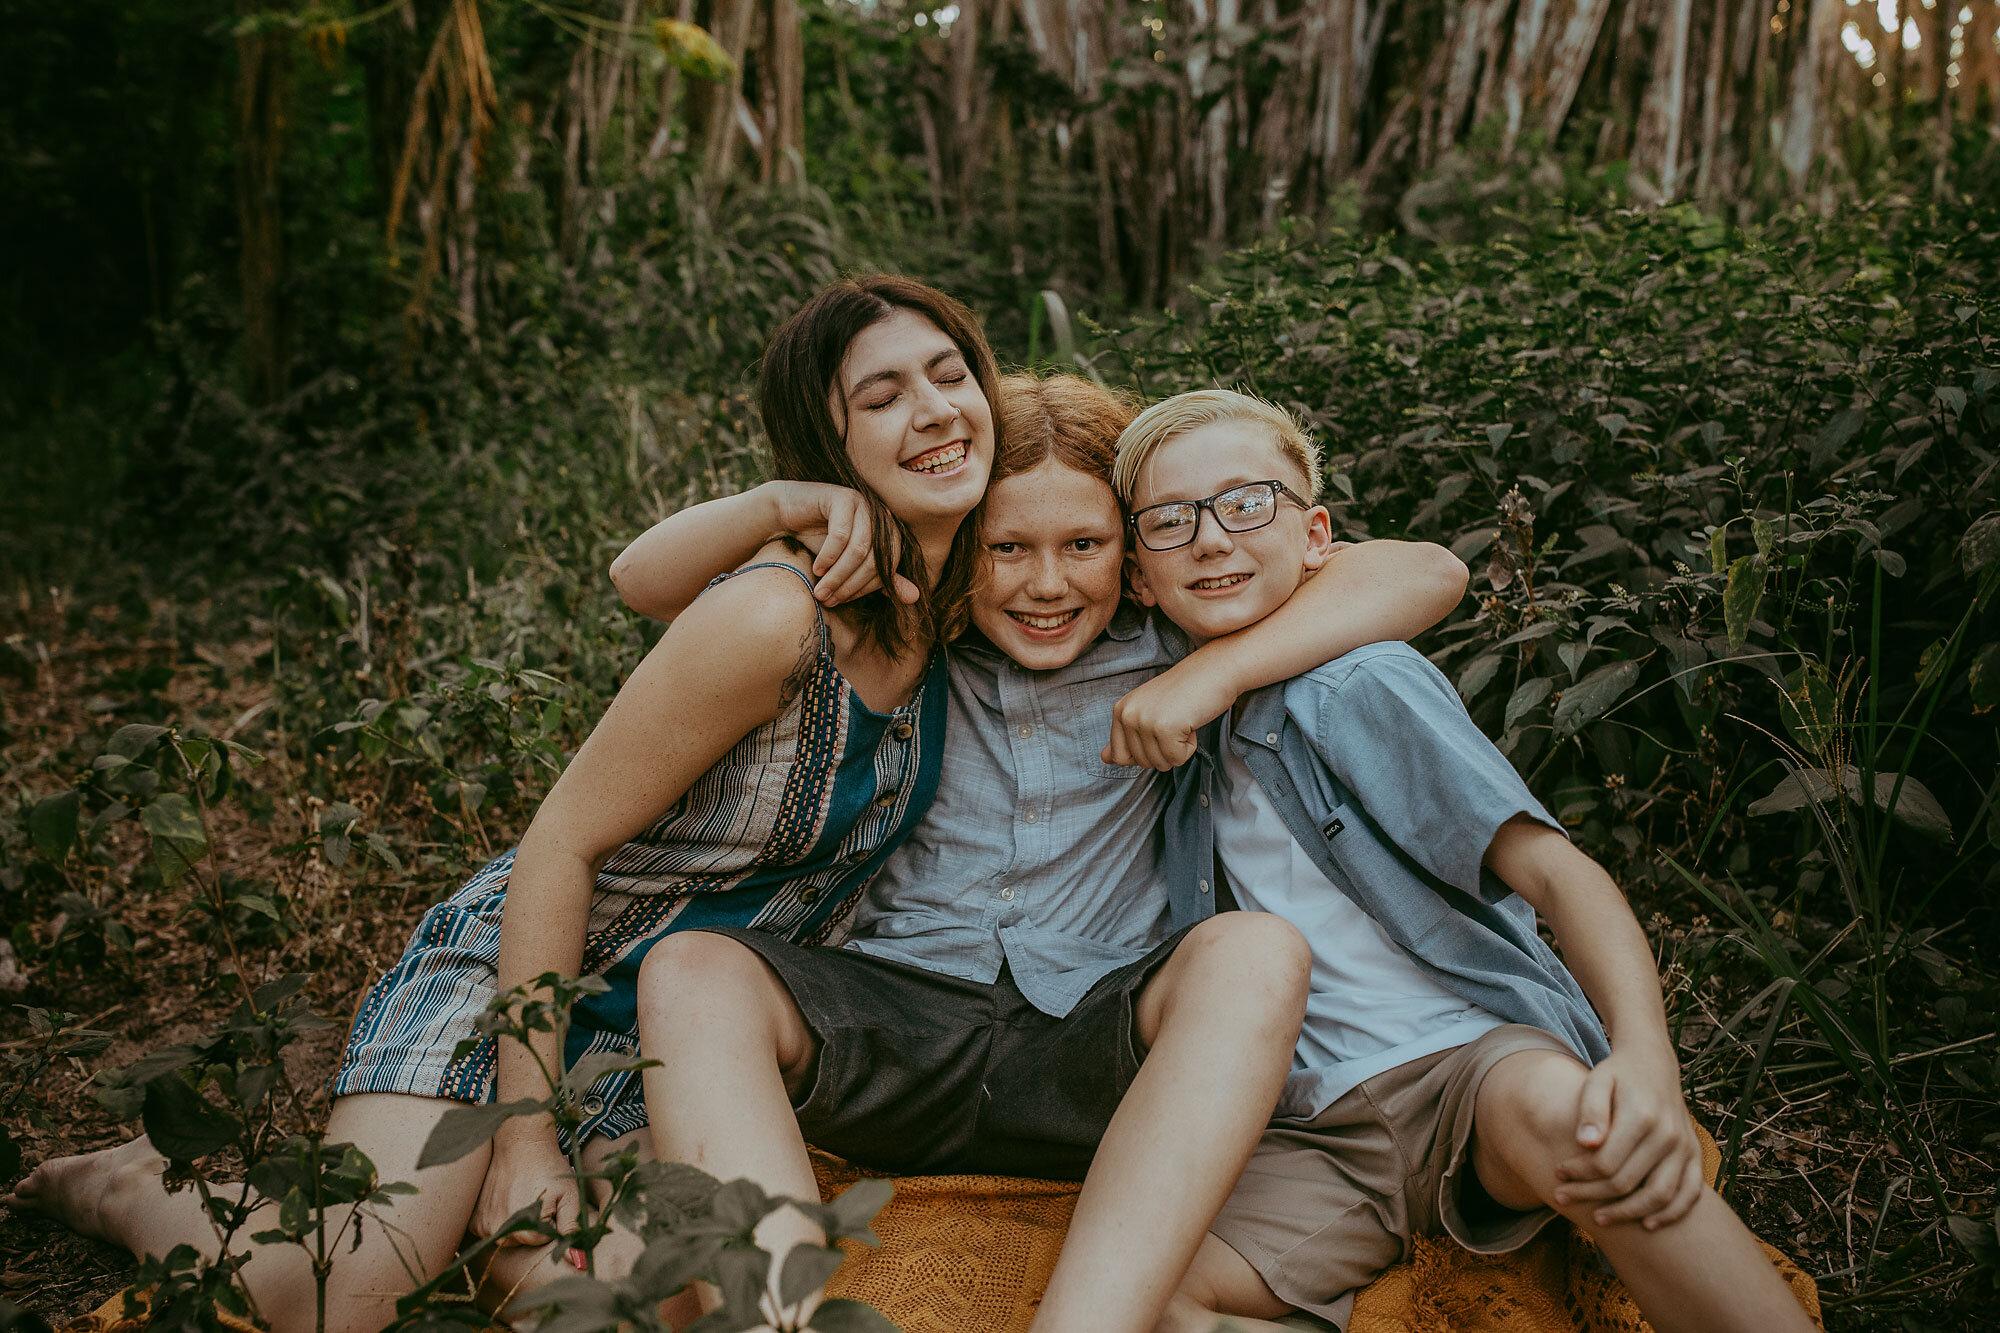 Oahu-Hawaii-Family-Photography-Family-Photos-05.jpg